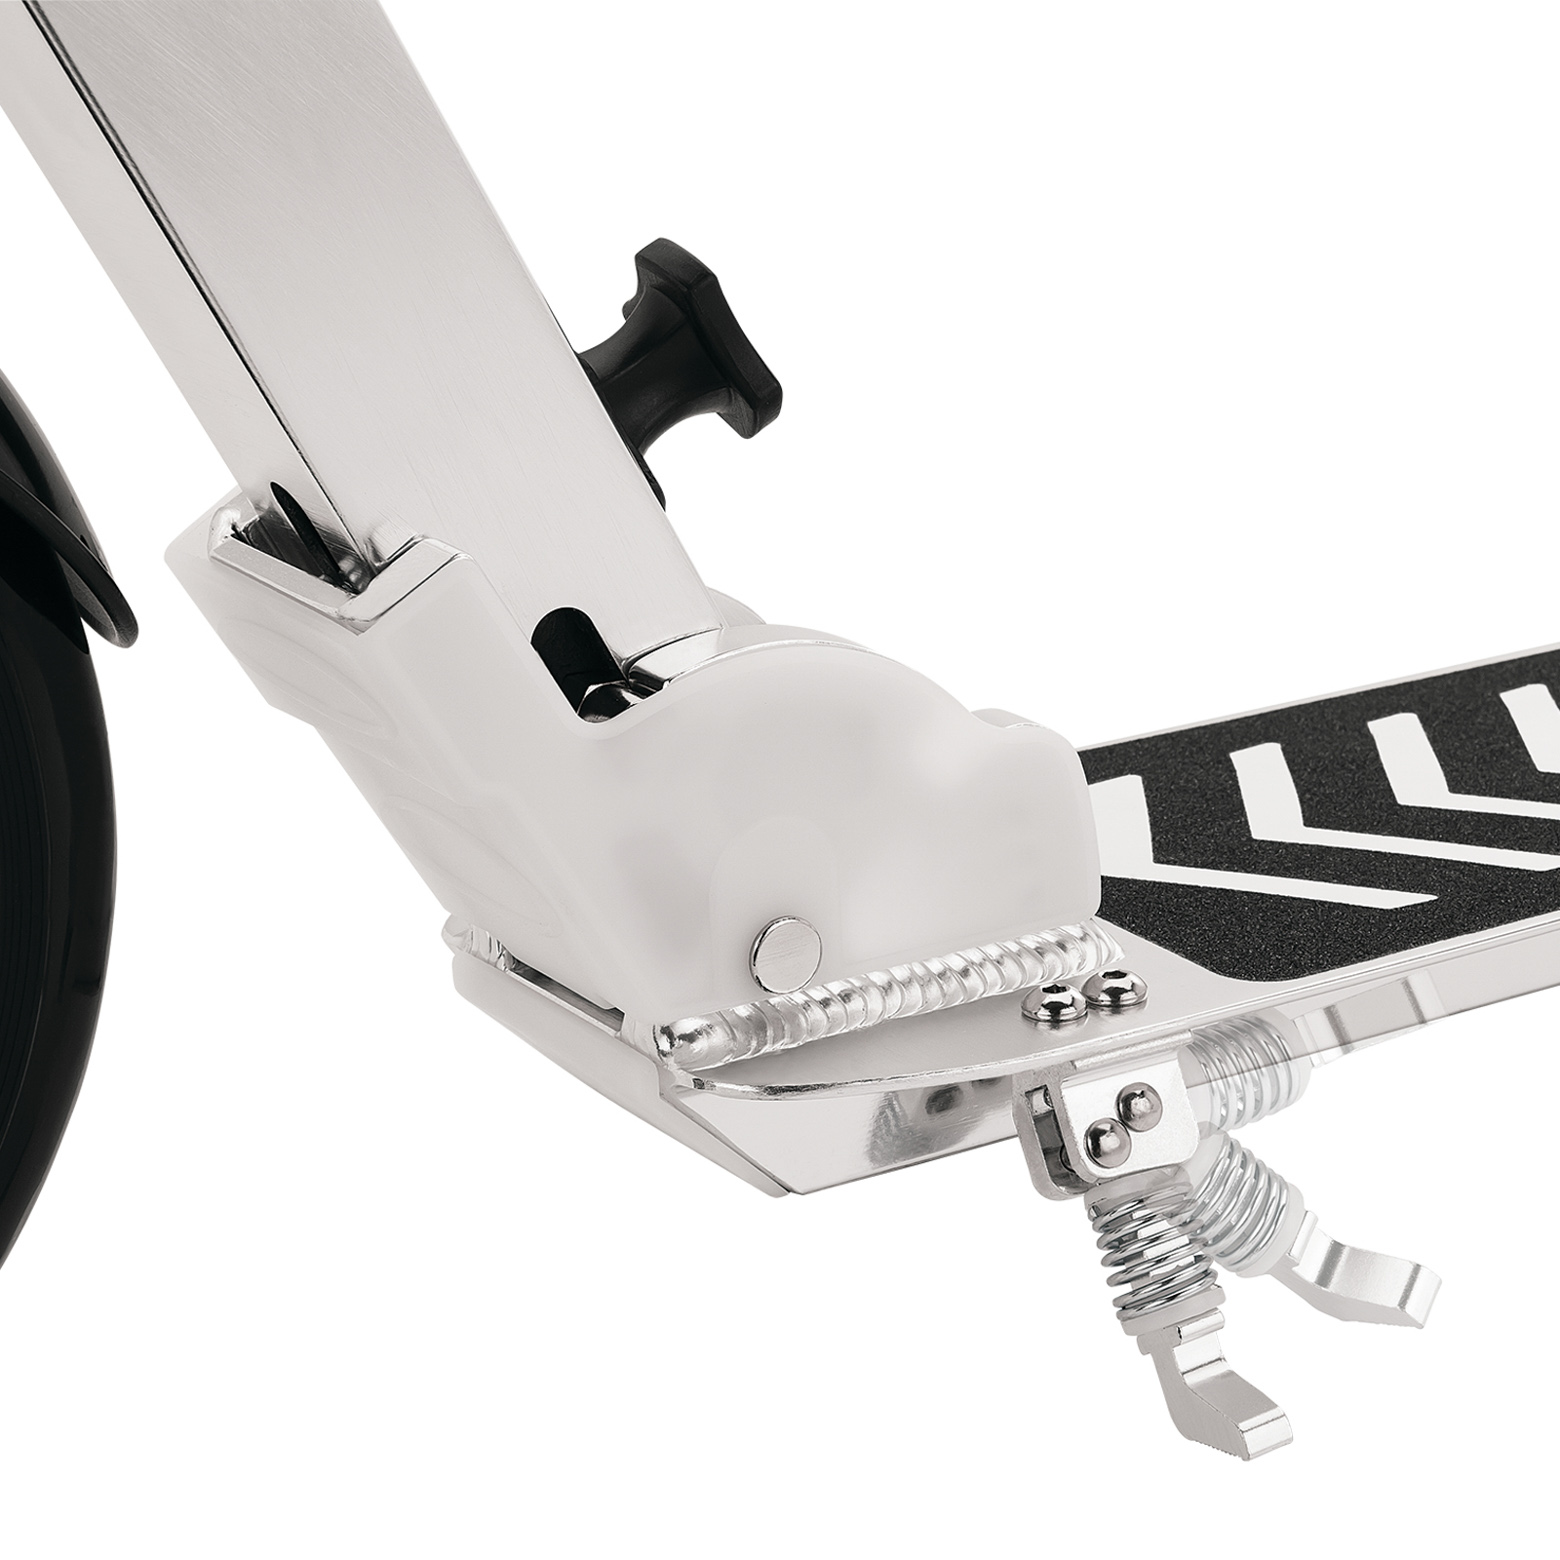 Razor A5 DLX SL/BK